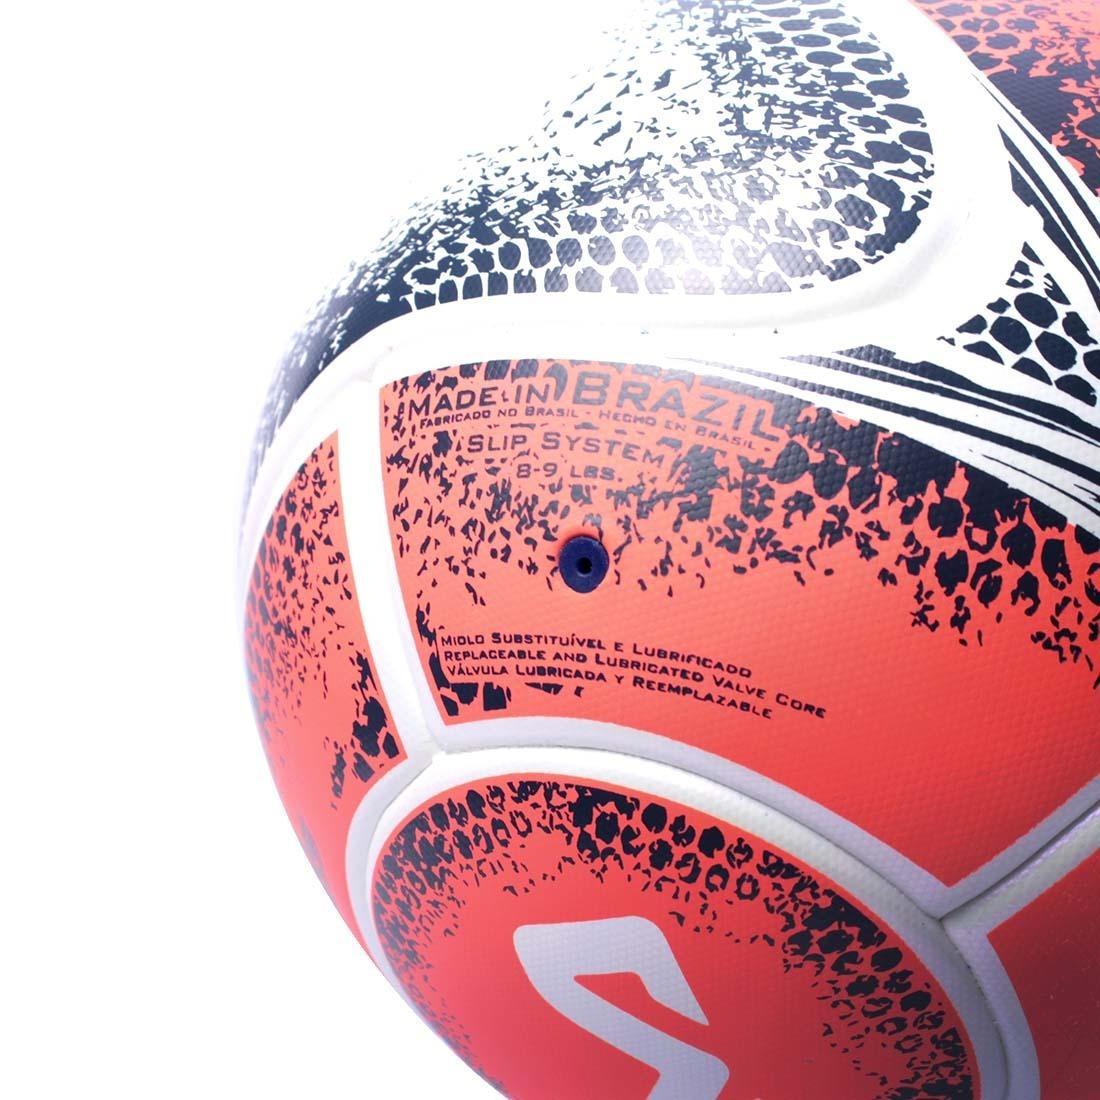 00d56f0146 Bola Futsal Penalty Max 1000 Aprovada Fifa 2018 Original - R  203